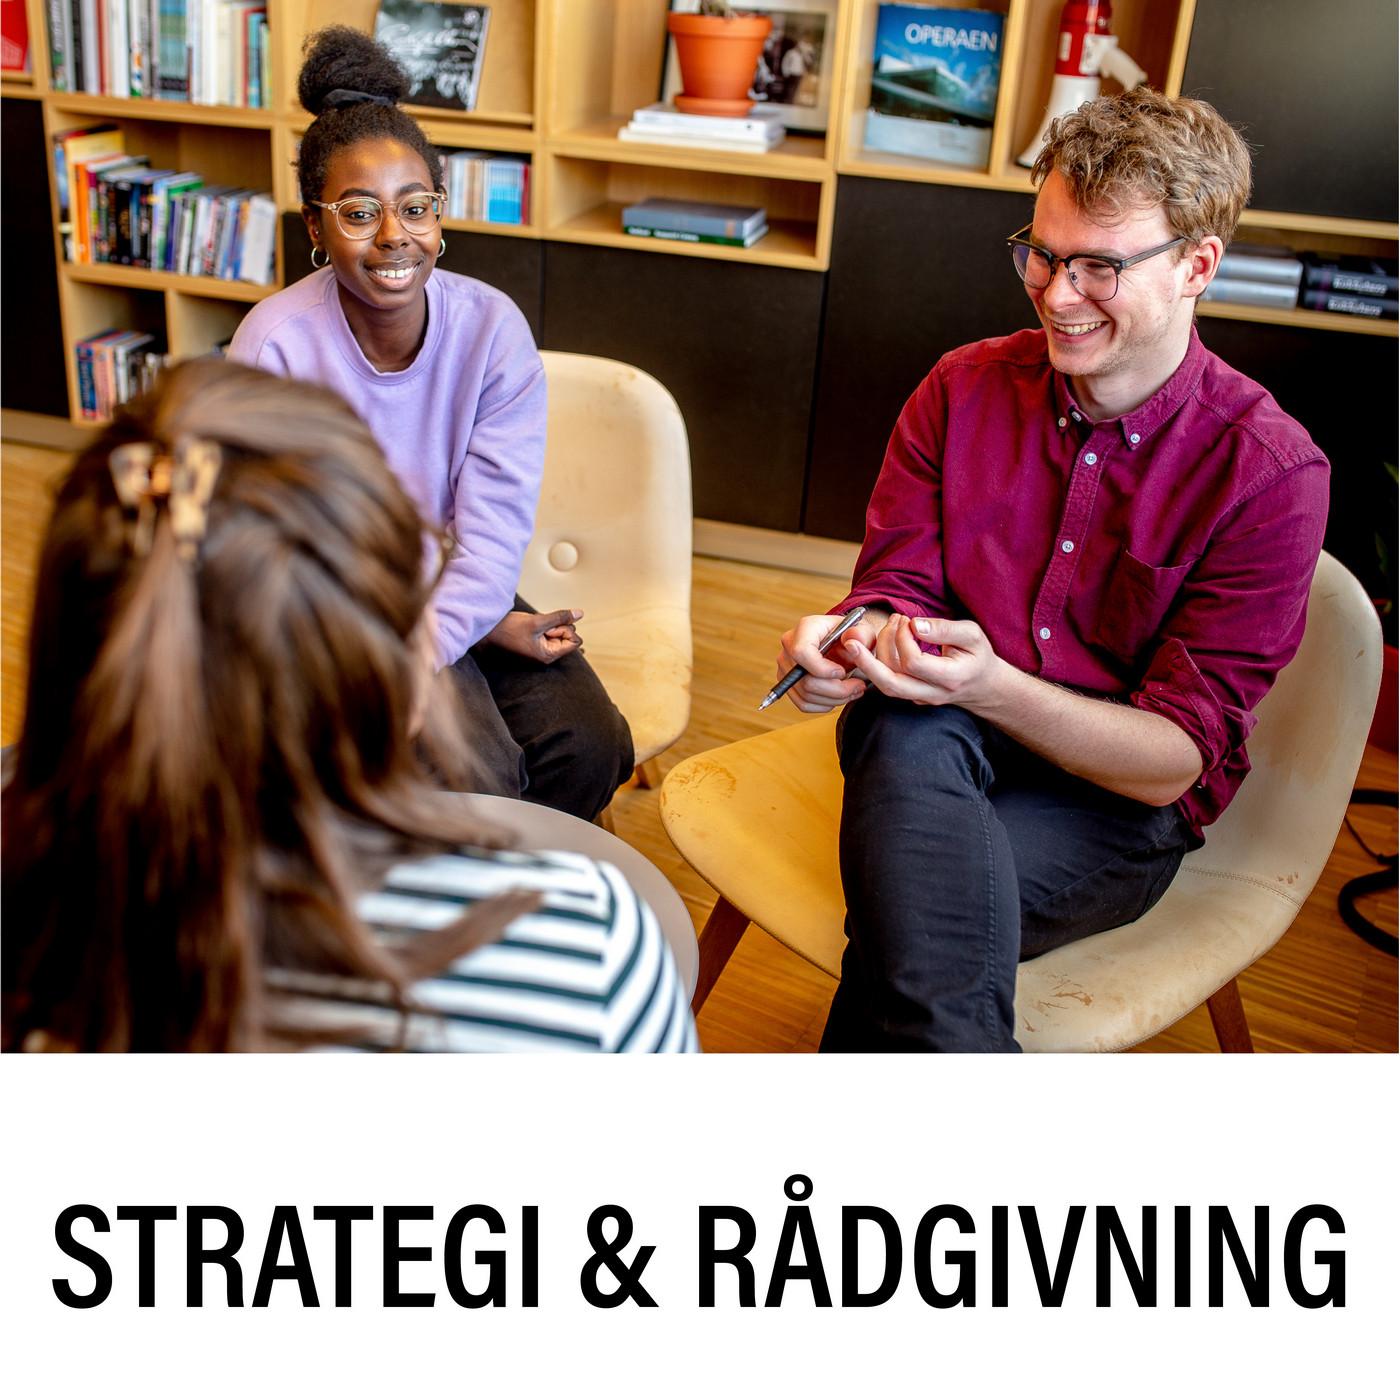 Strategi og rådgivning